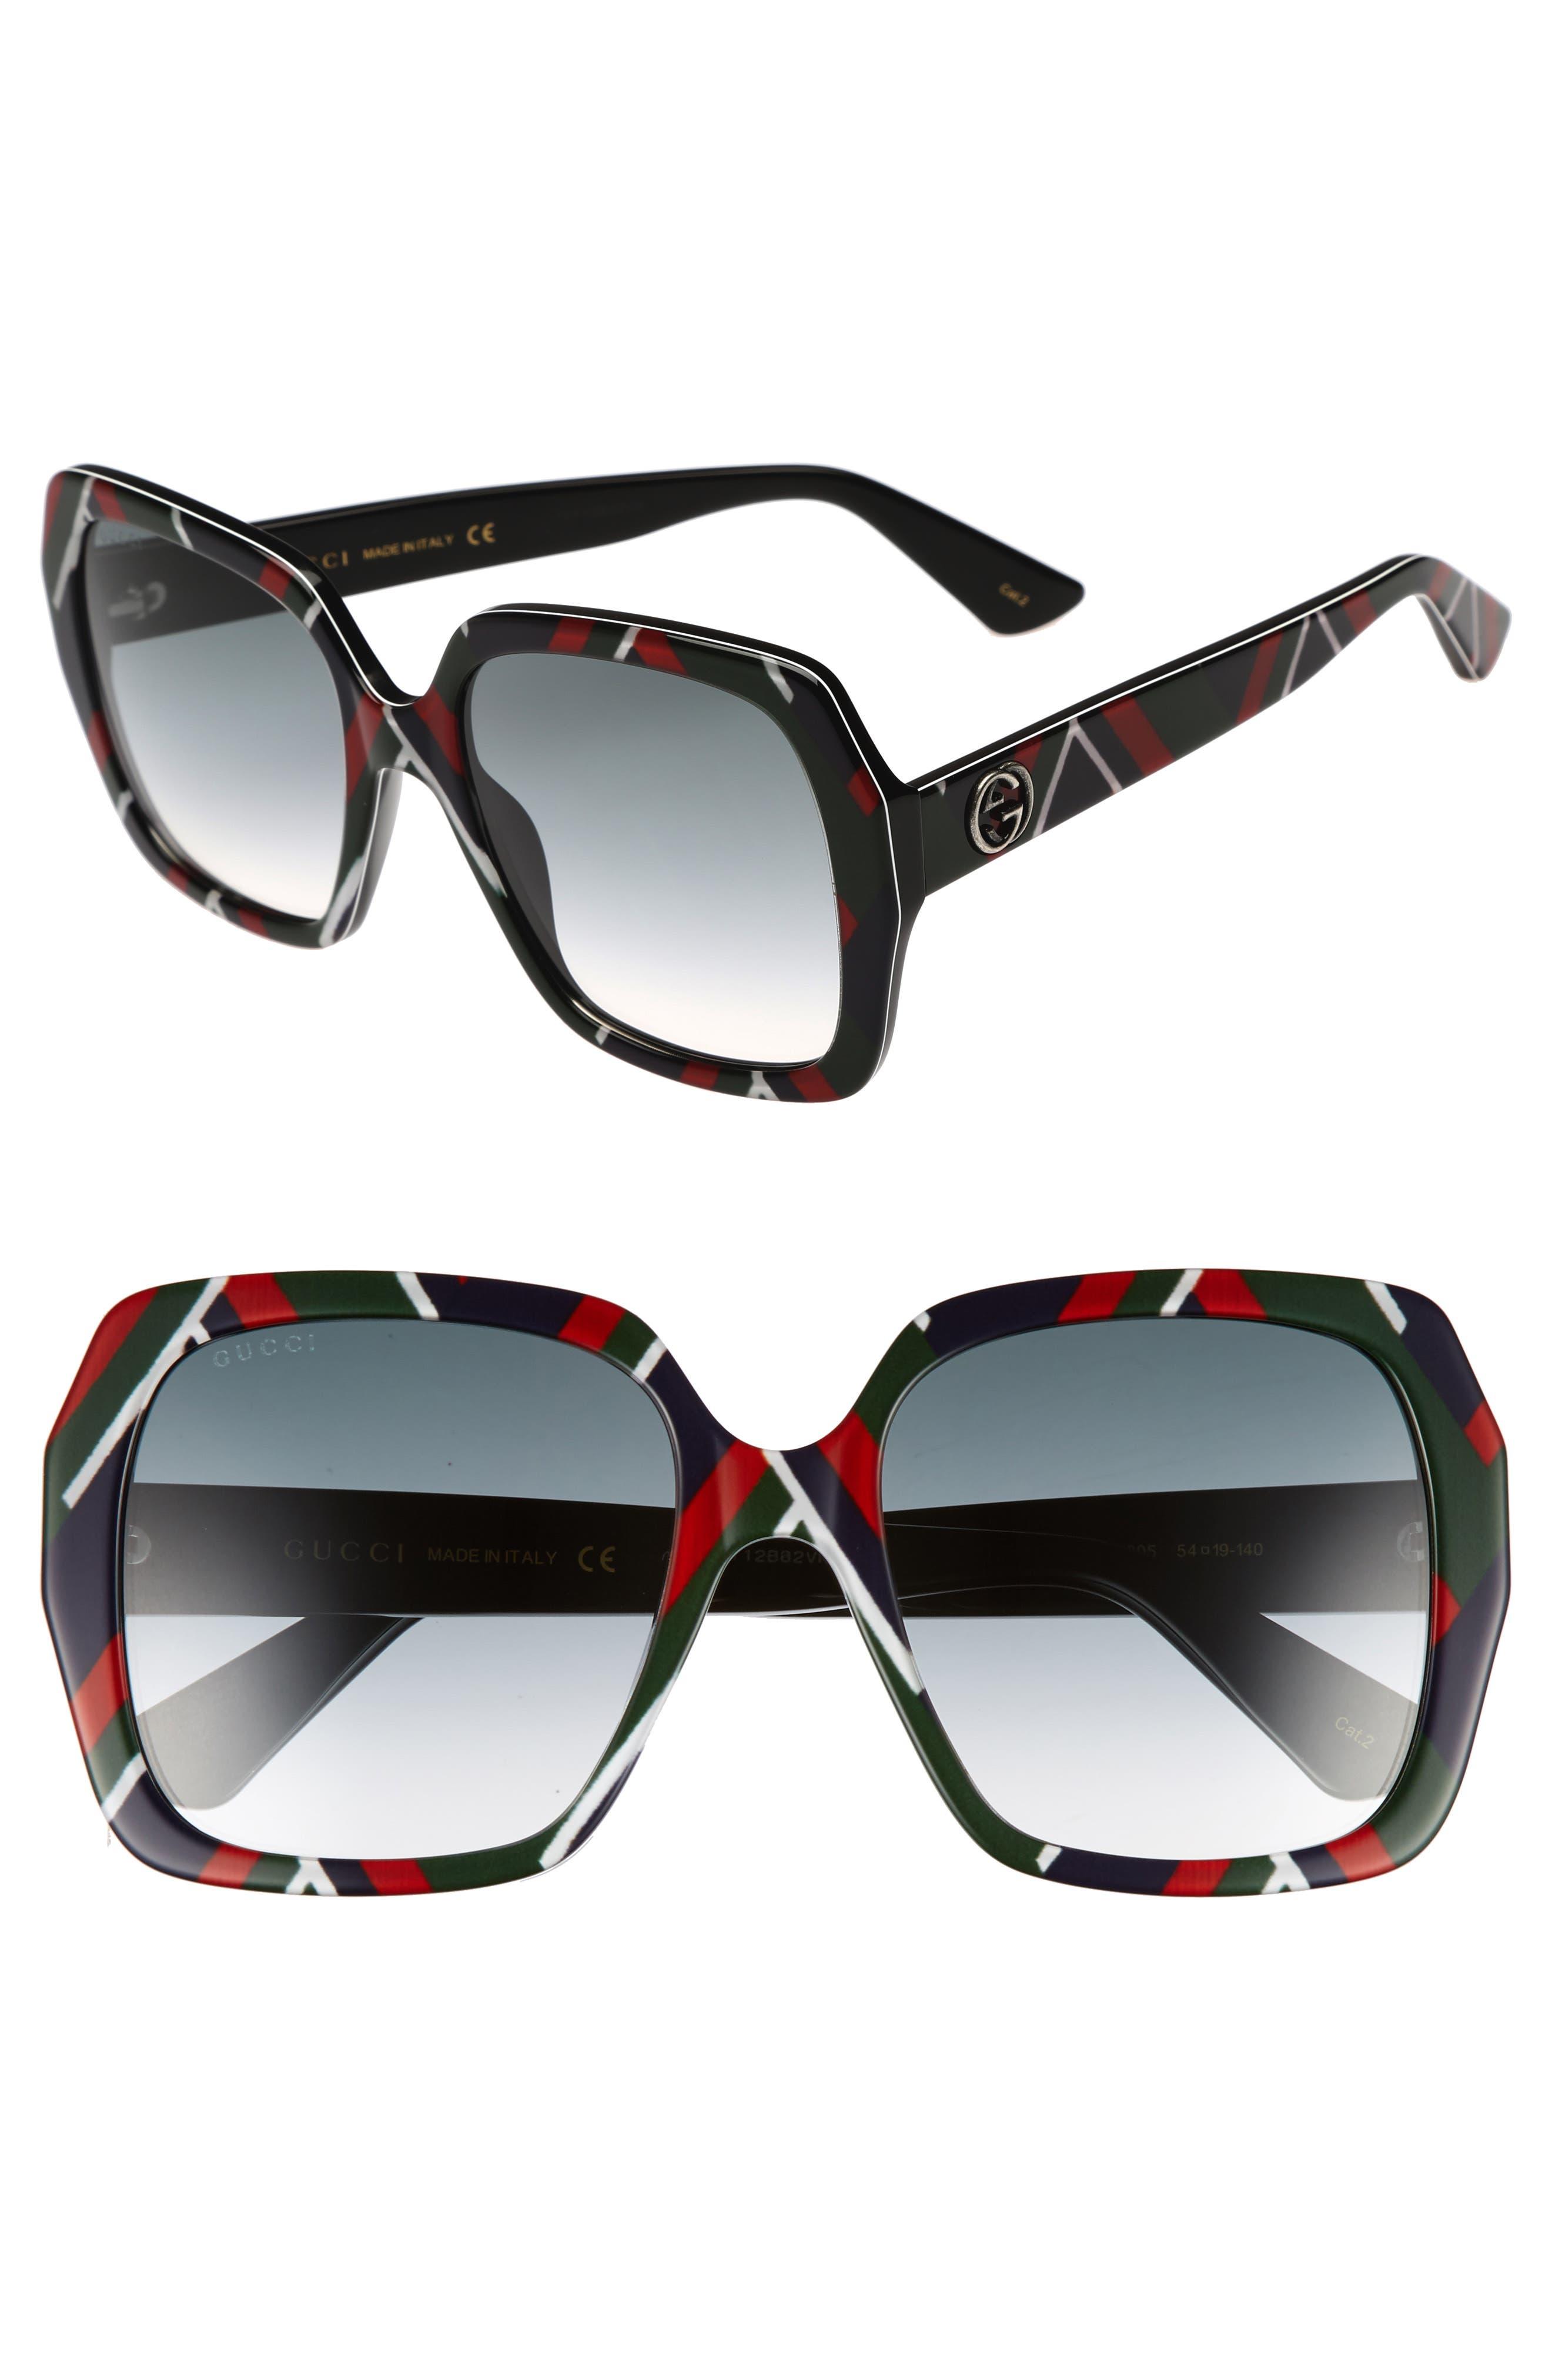 Alternate Image 1 Selected - Gucci 54mm Gradient Square Sunglasses